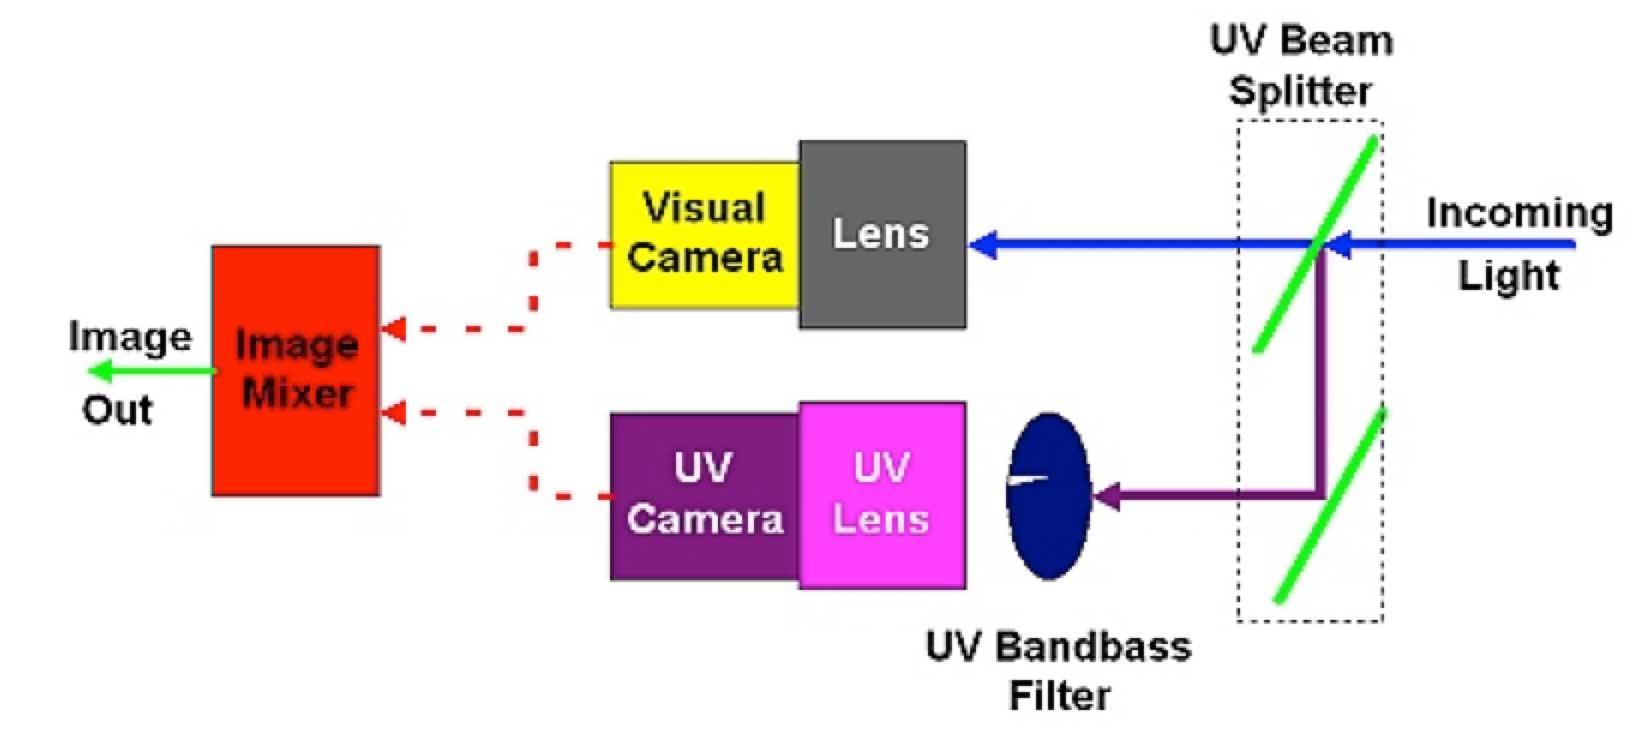 composite insulator Comparison of Methodologies to Detect Damaged Composite Insulators Principle of operation of daylight UV camera